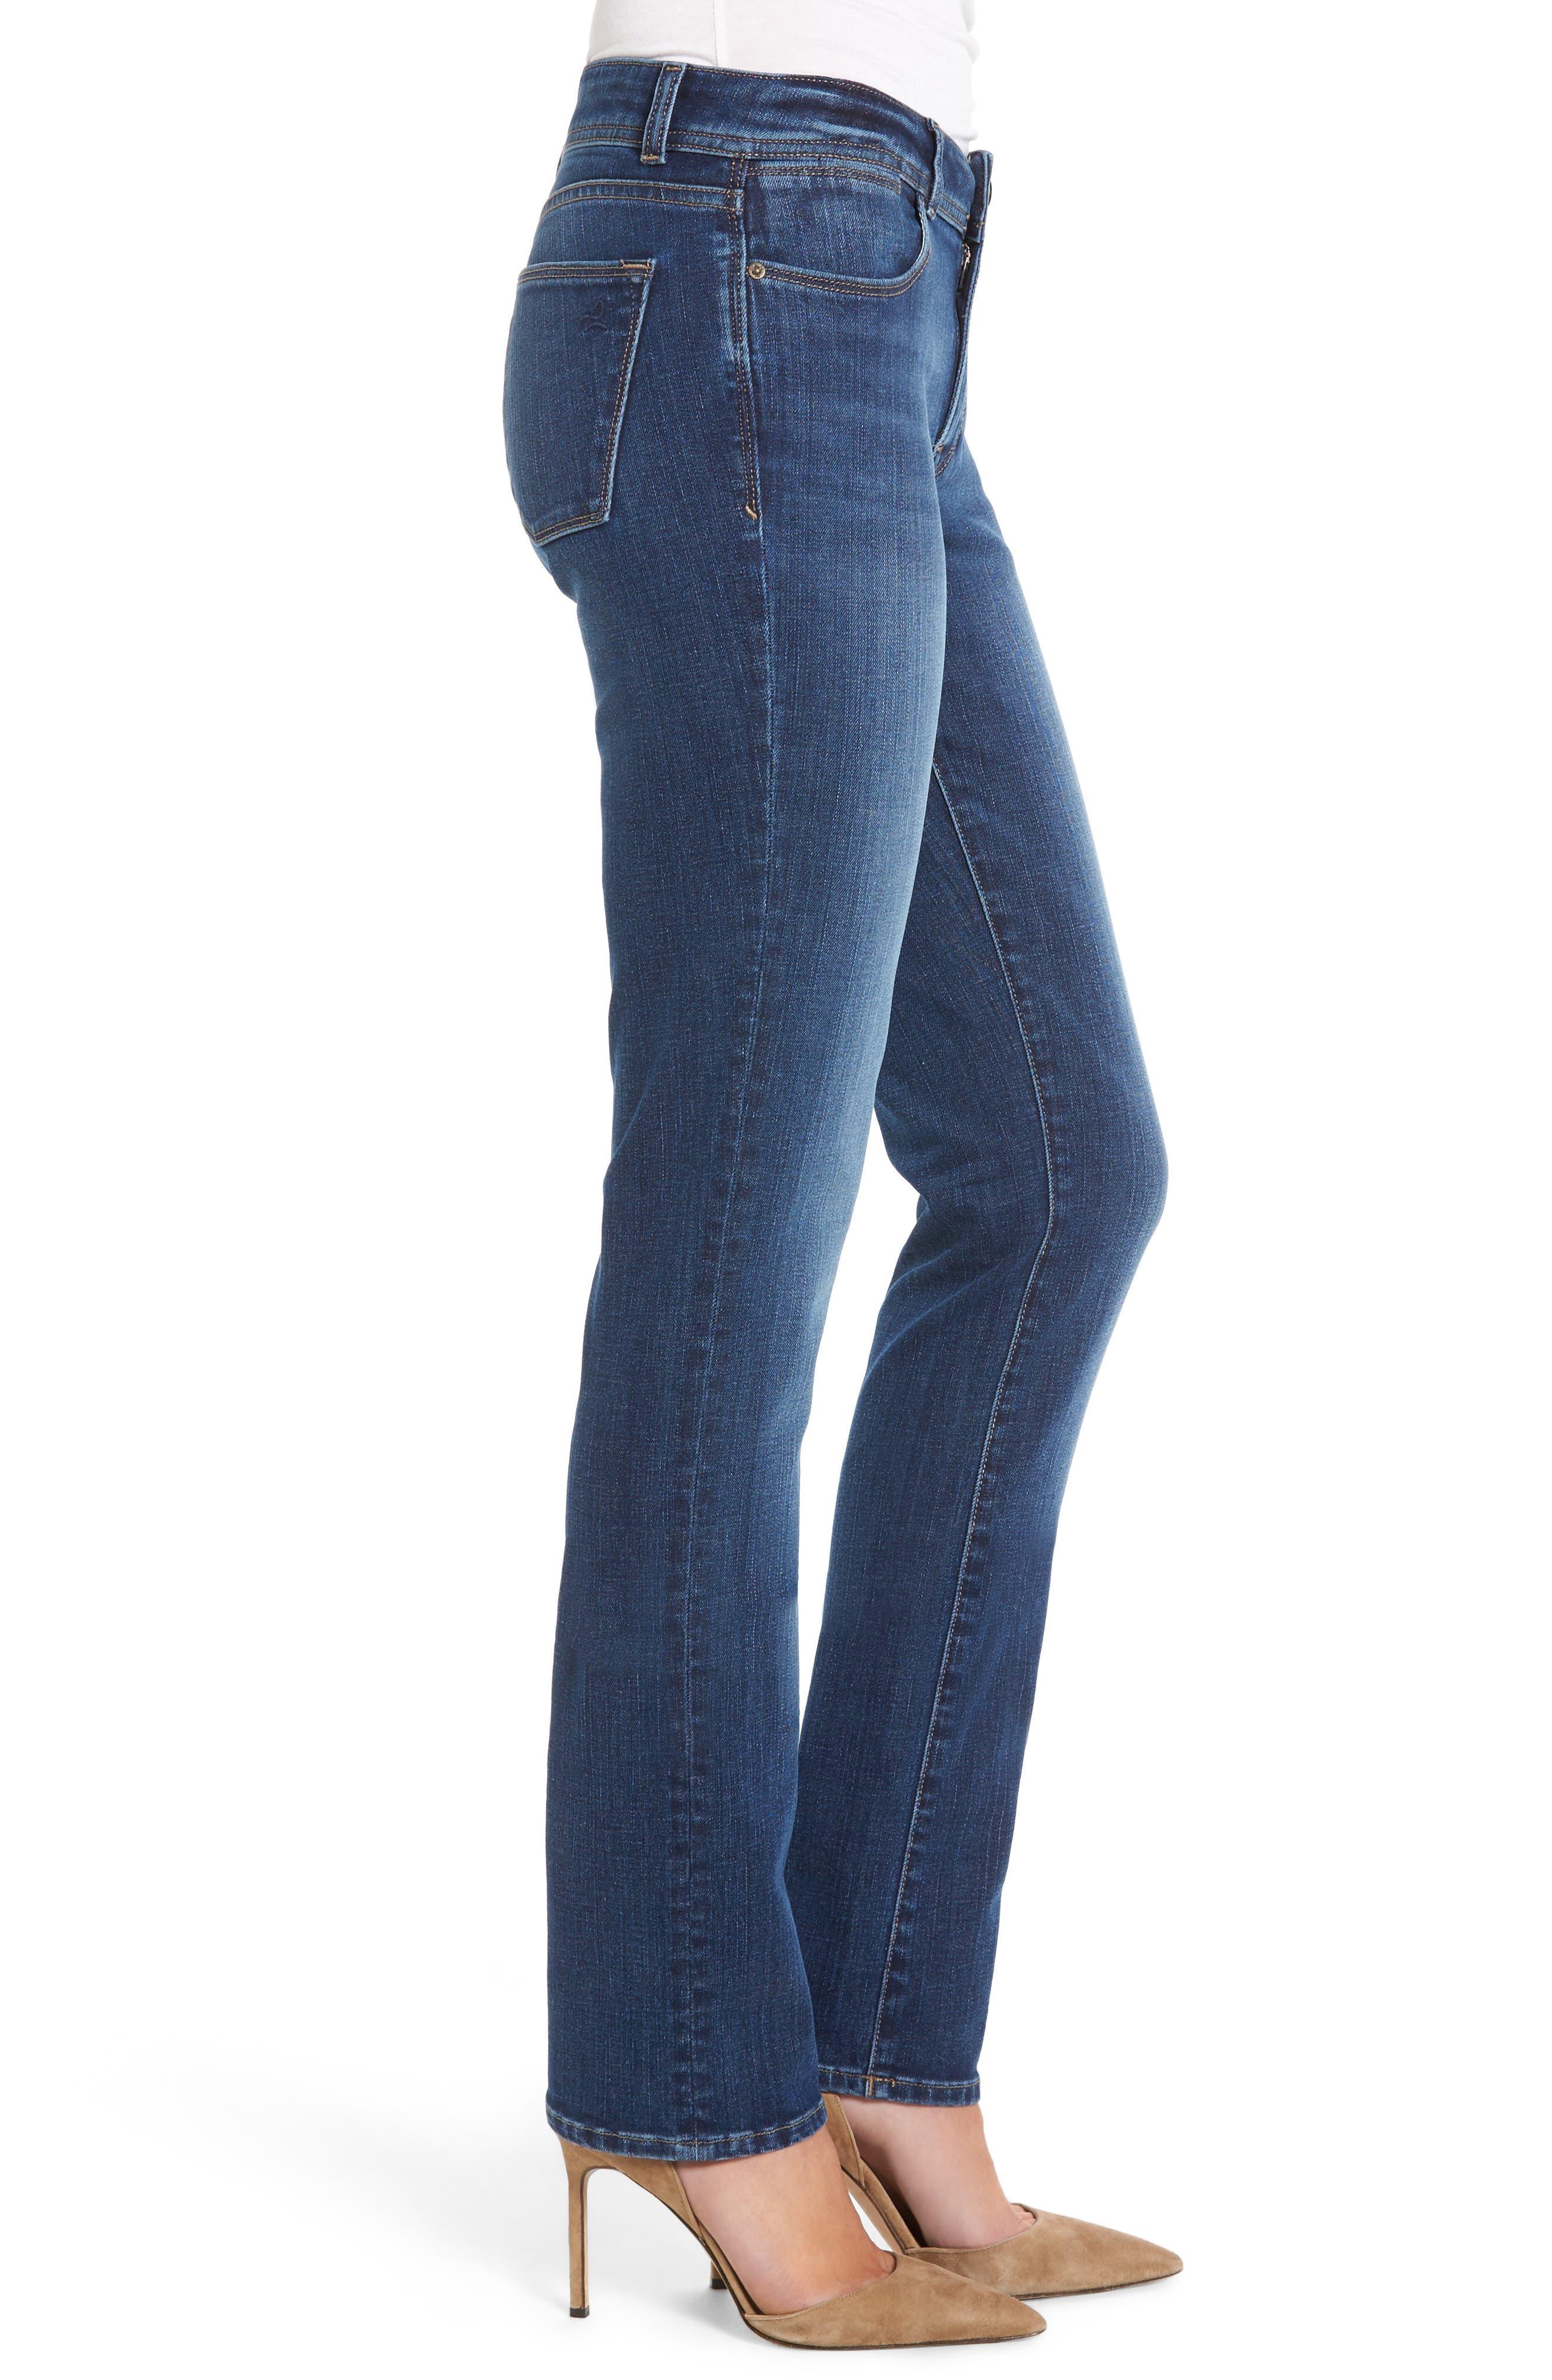 Coco Curvy Straight Leg Jeans,                             Alternate thumbnail 3, color,                             405